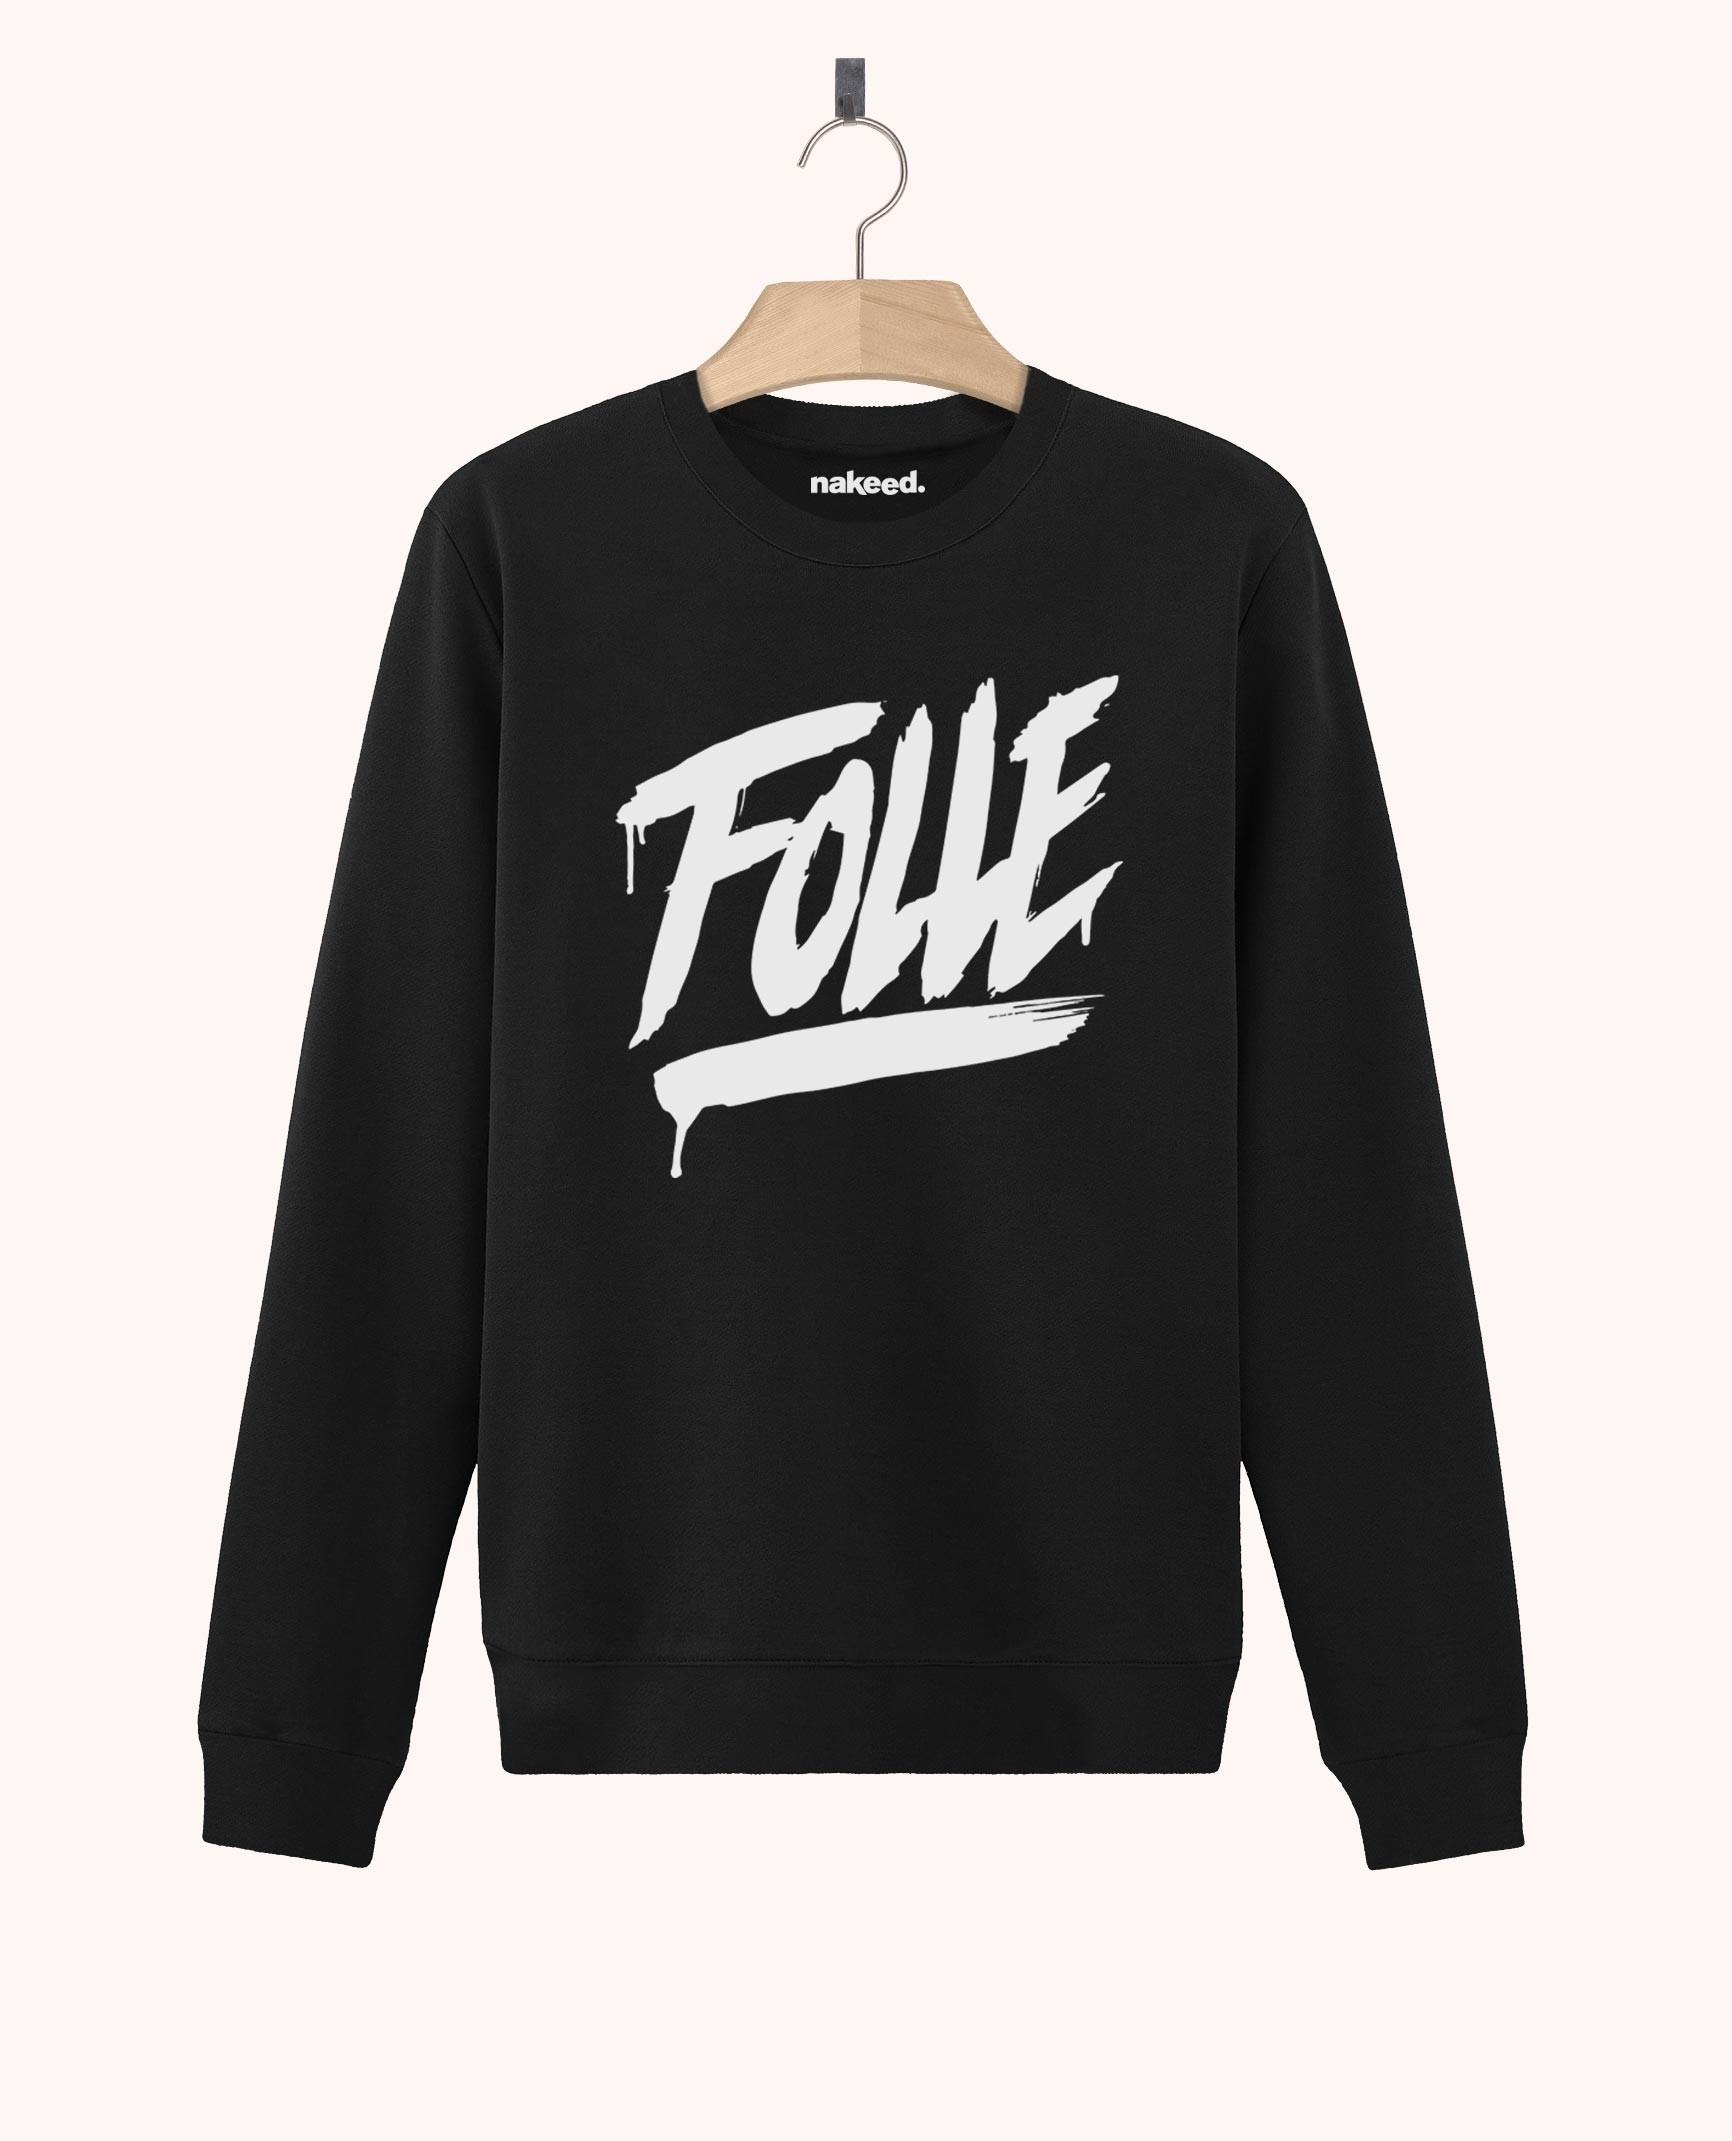 Sweatshirt Folle